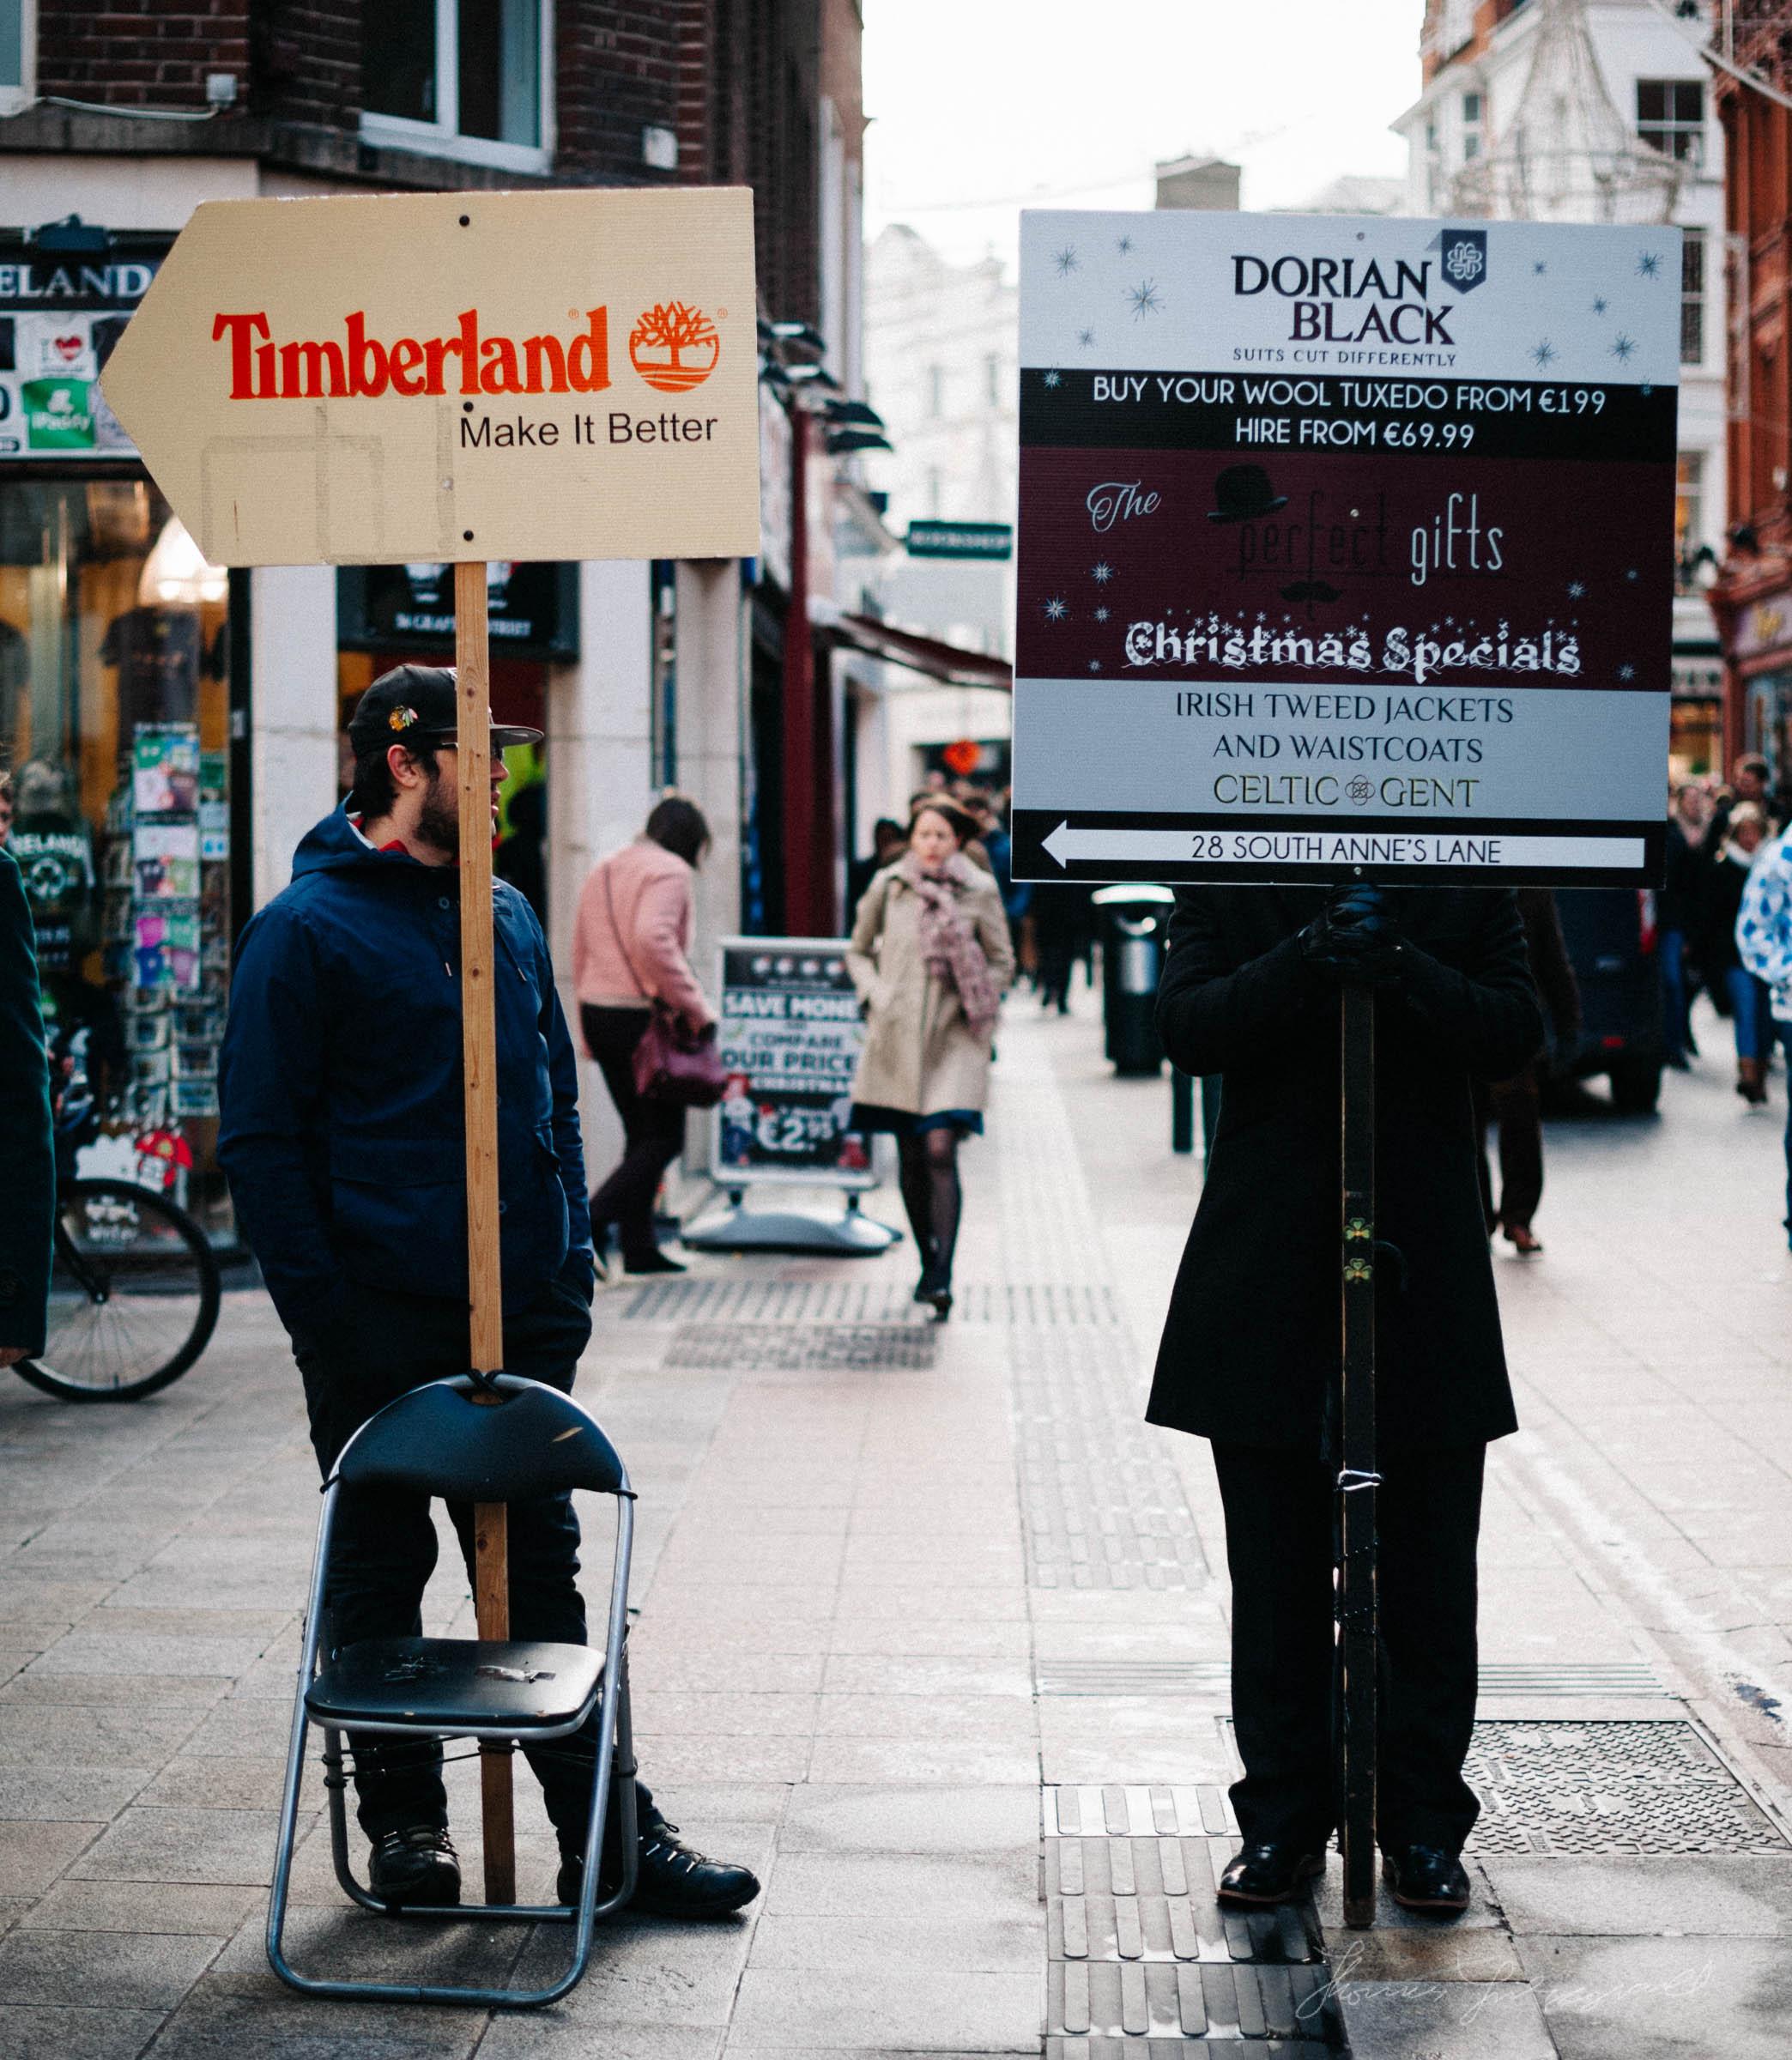 Street-photo-diary-eleven-05.jpg